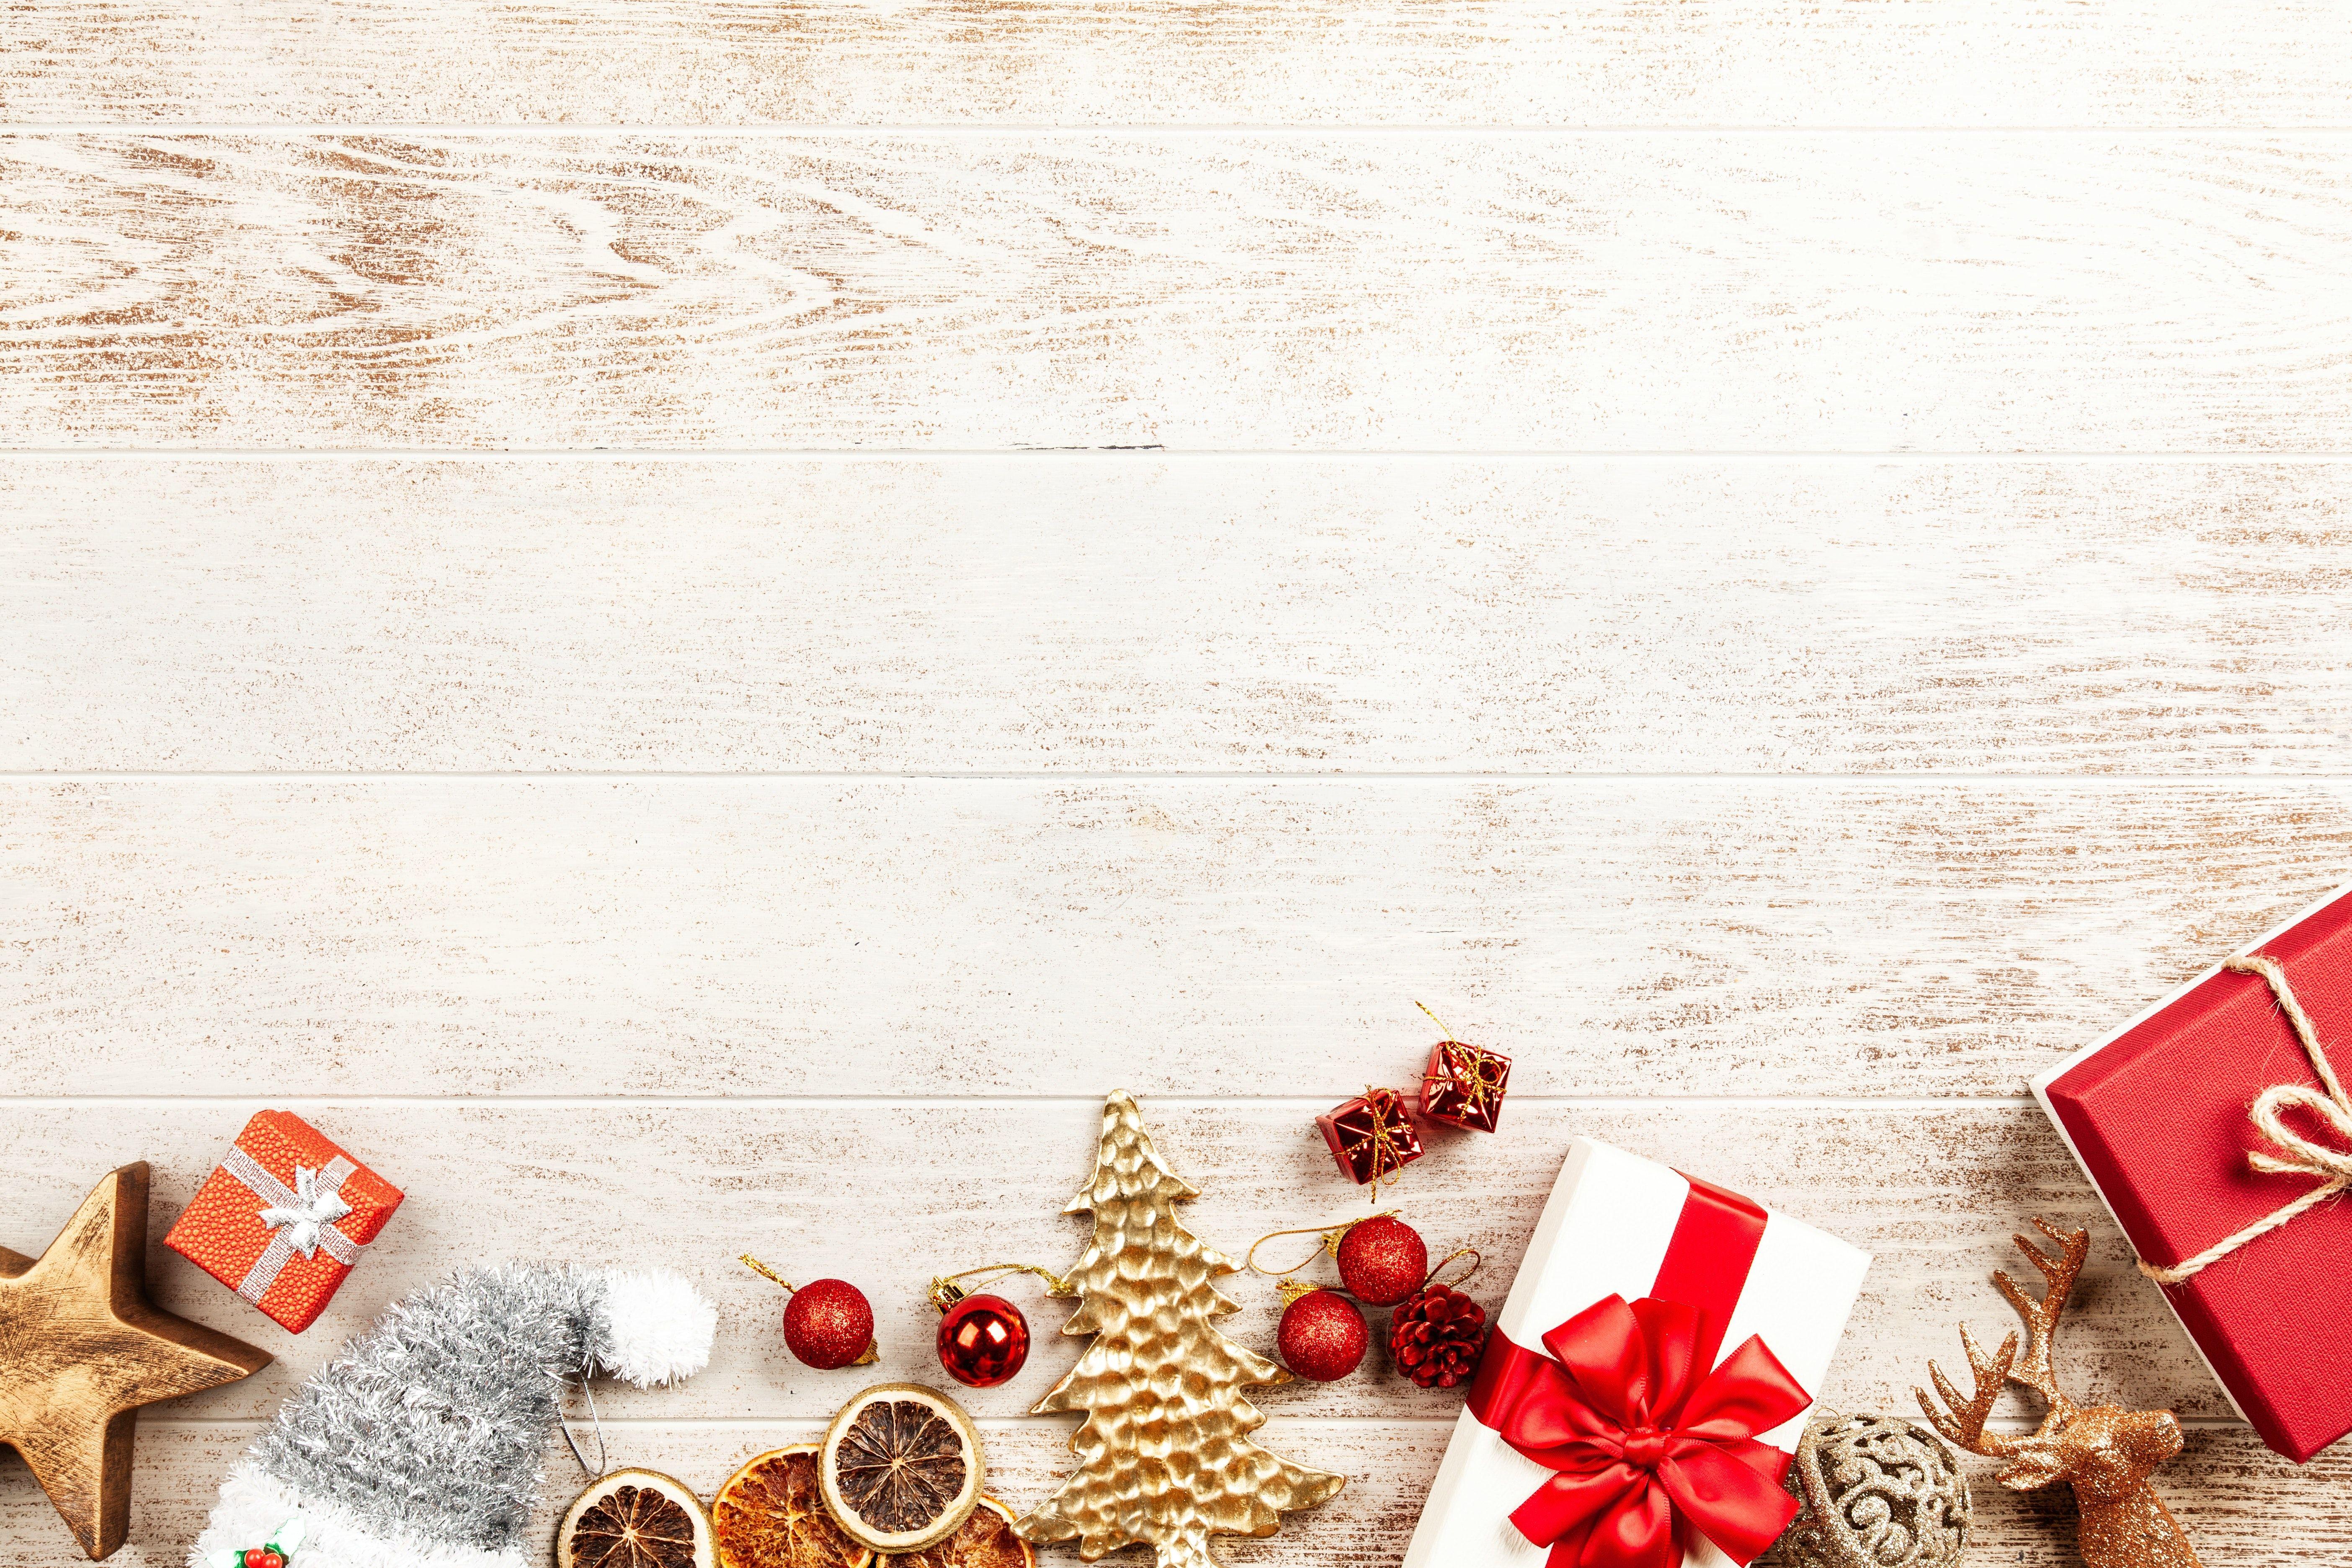 The Ultimate Christmas Gift Ideas Secret Santa Gifts Free Christmas Gifts Best Secret Santa Gifts